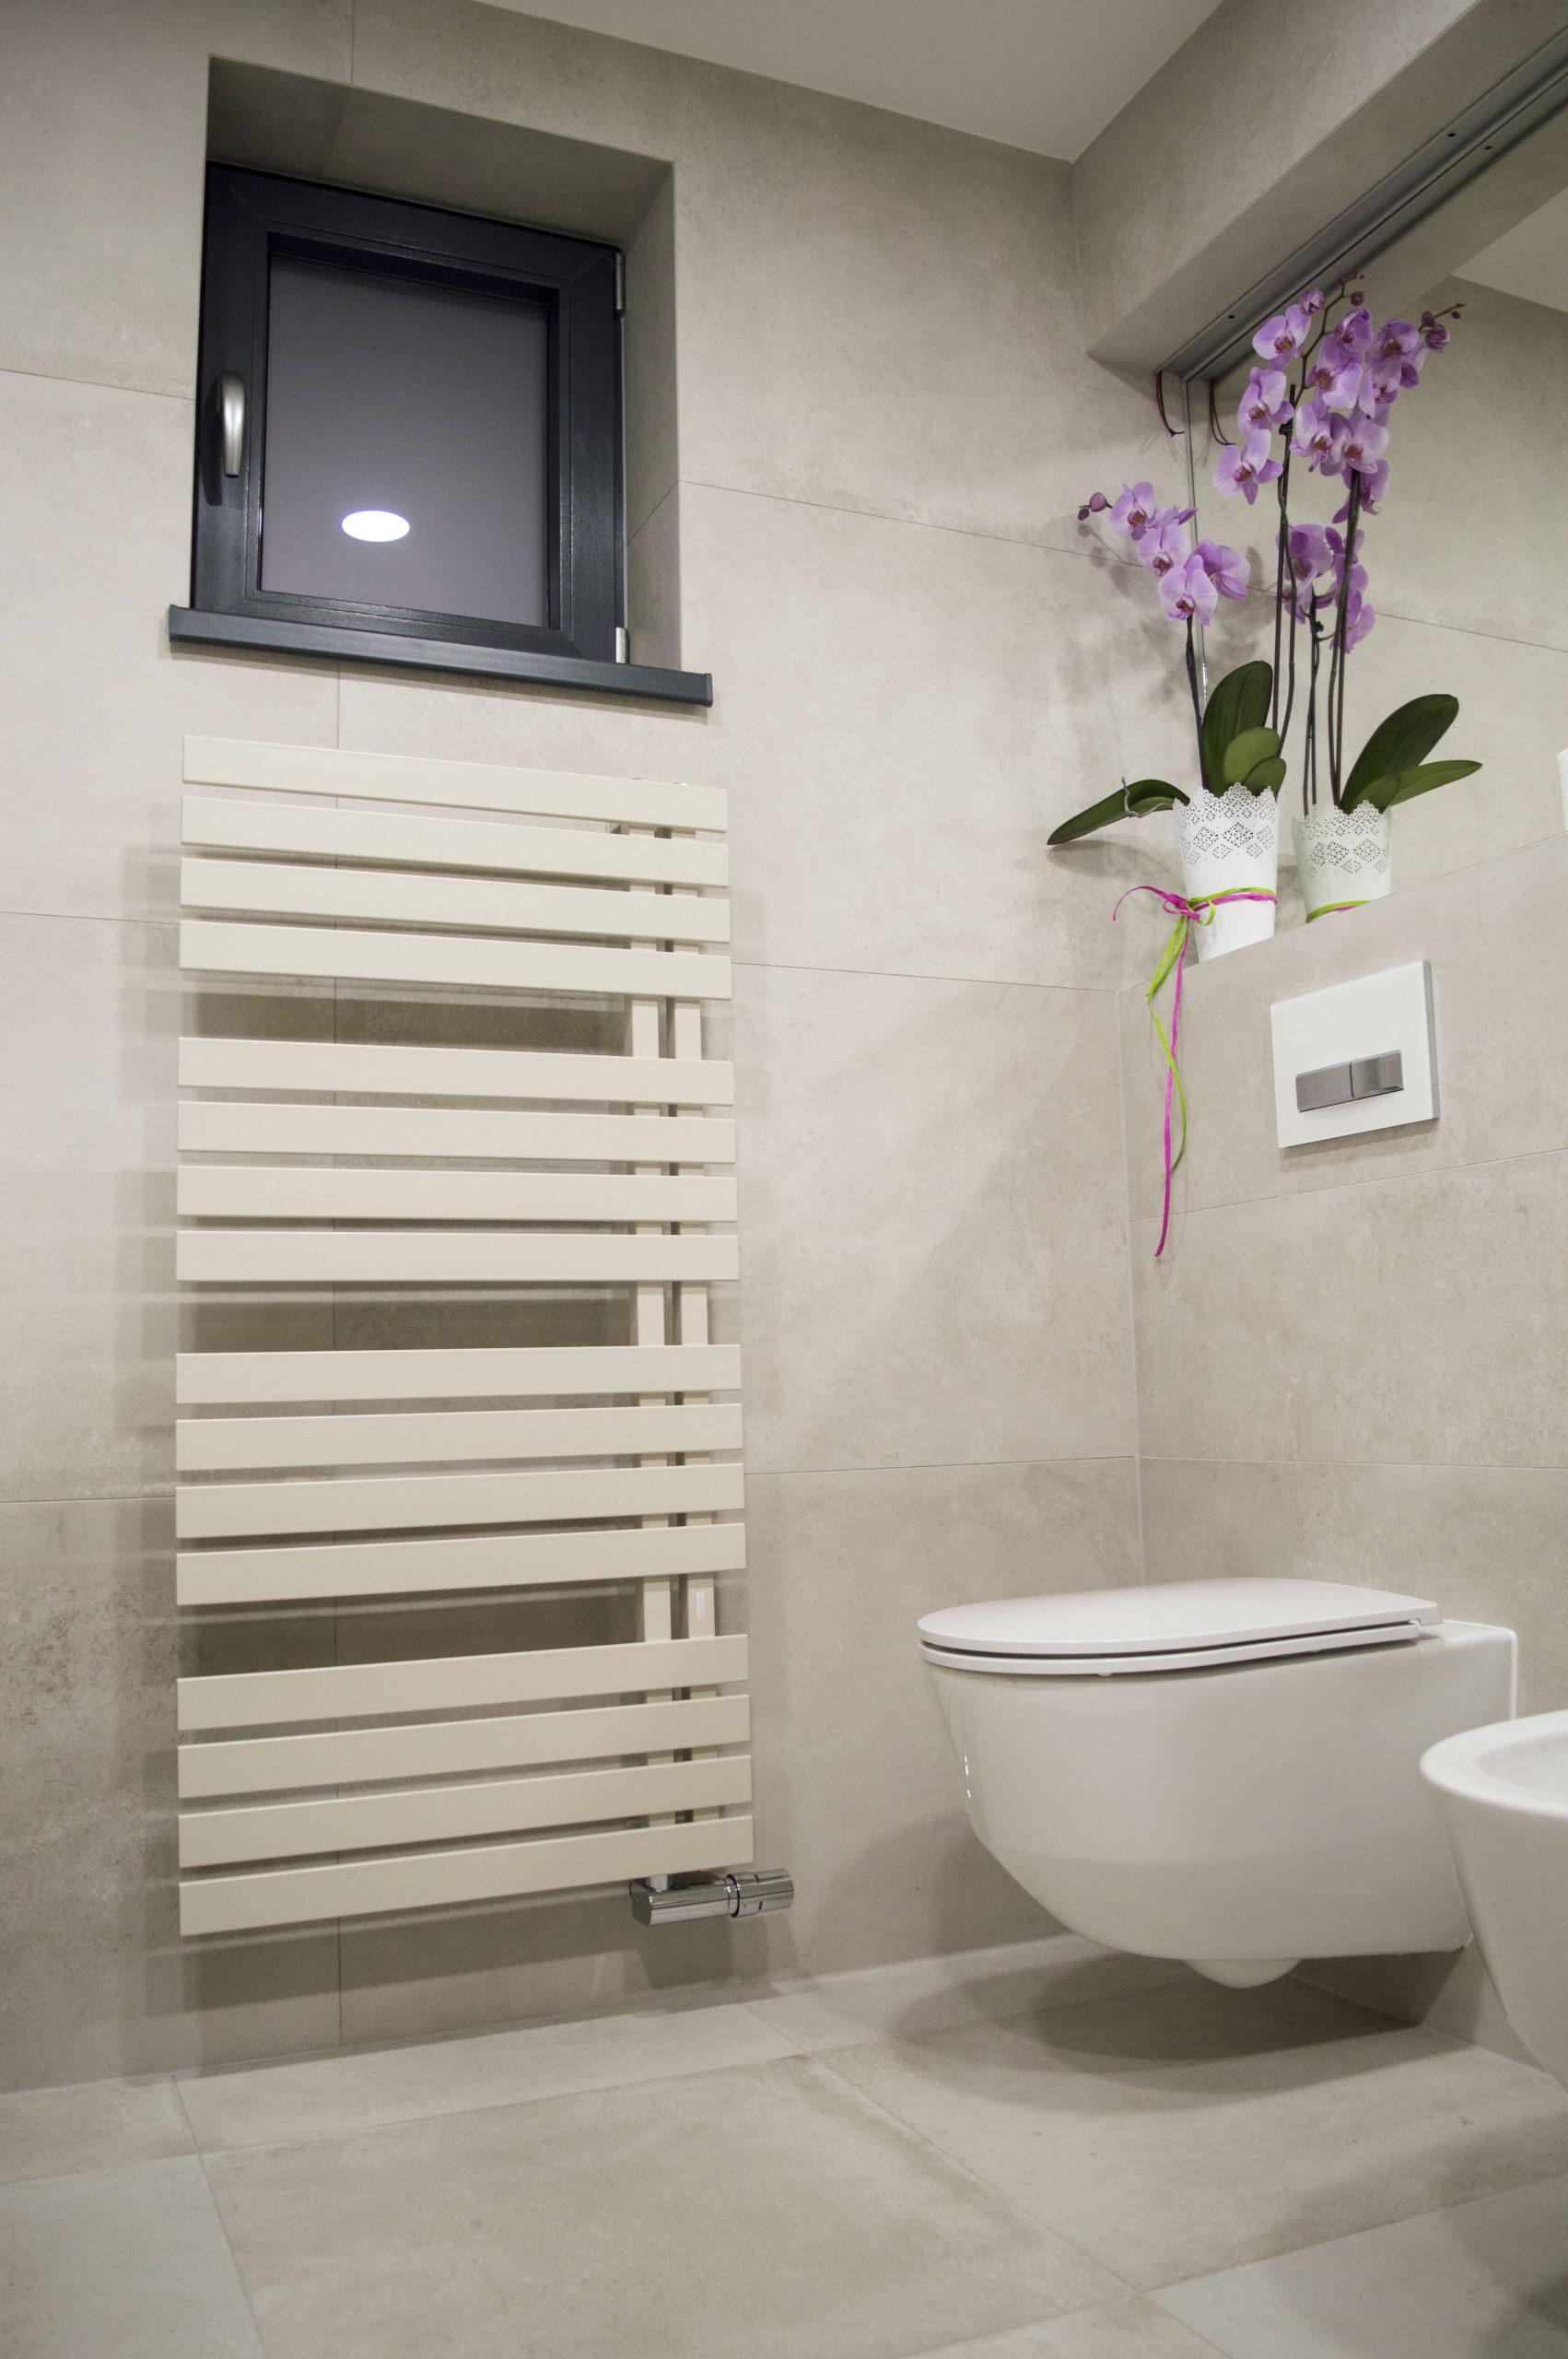 Kúpeľňový radiátor FLORIDA   LOTOSAN Kúpeľne a interiér